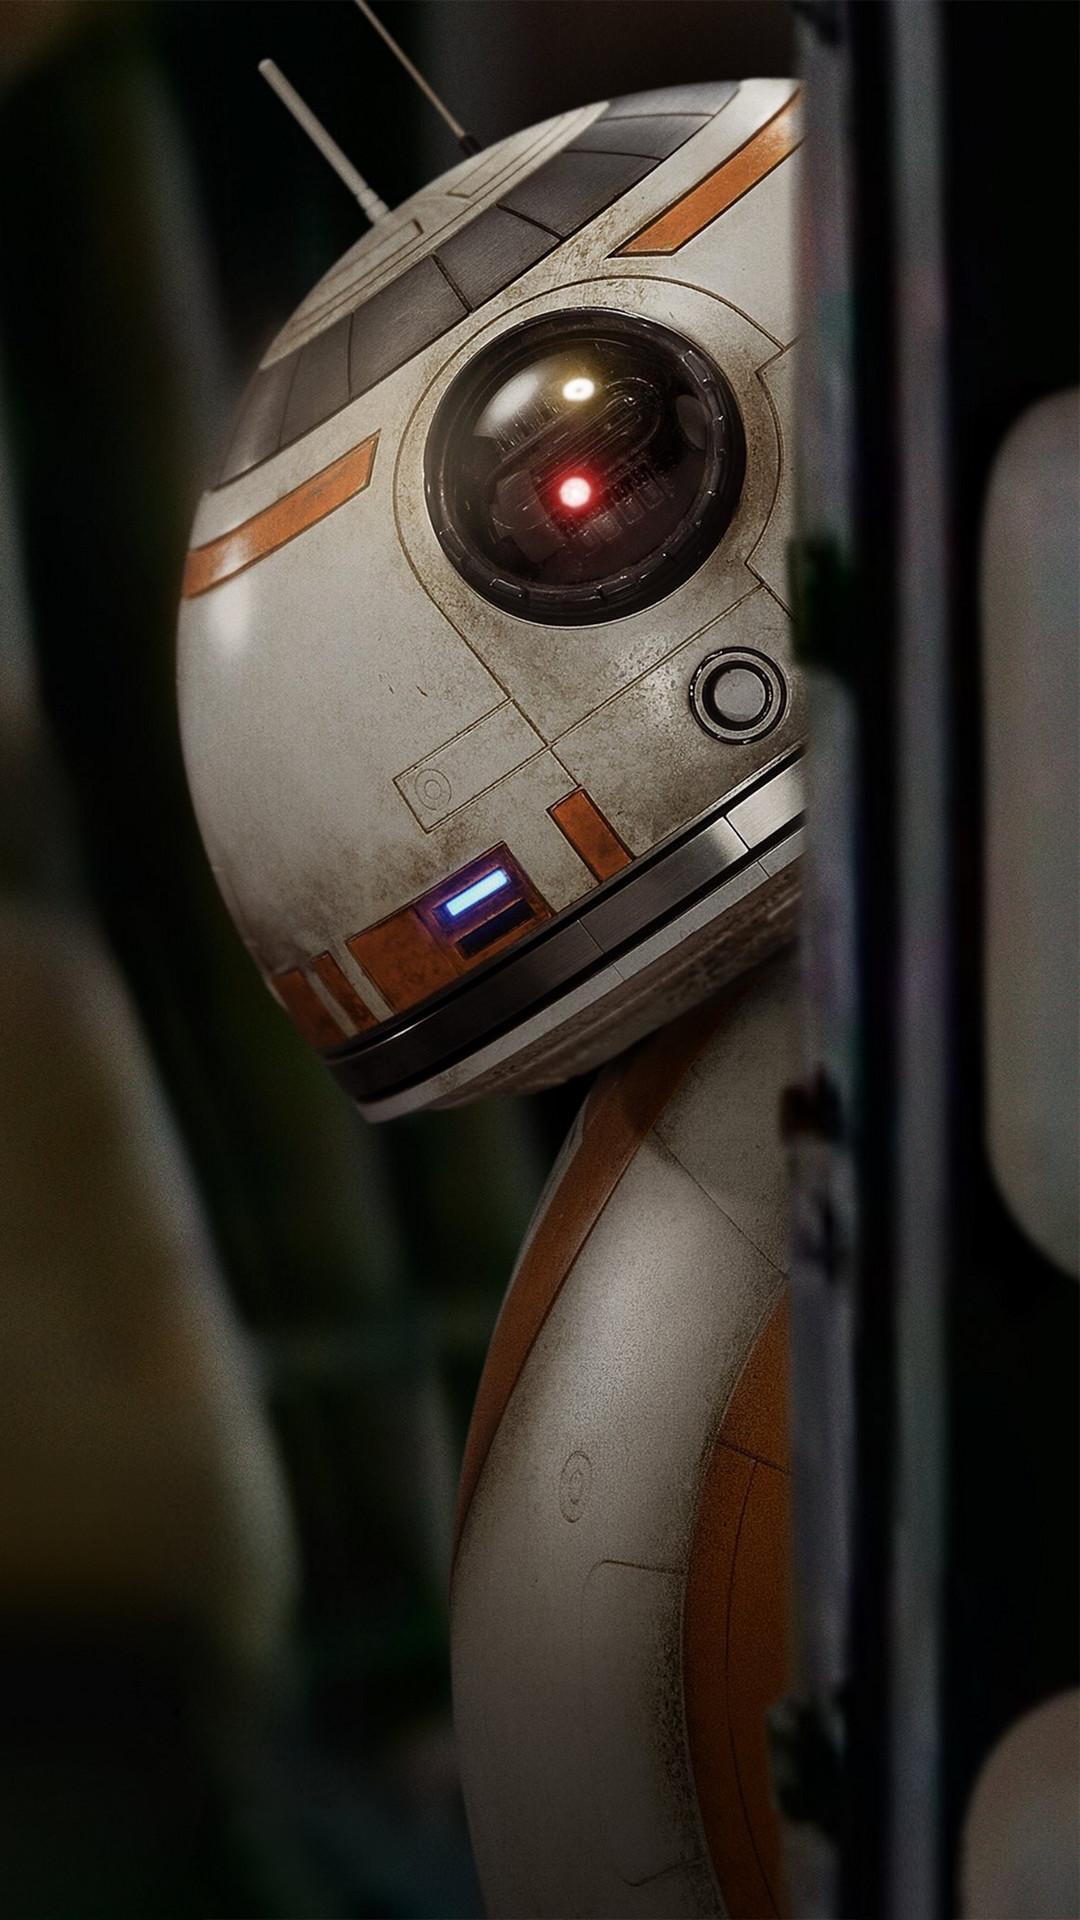 Previous Star Wars wallpaper post